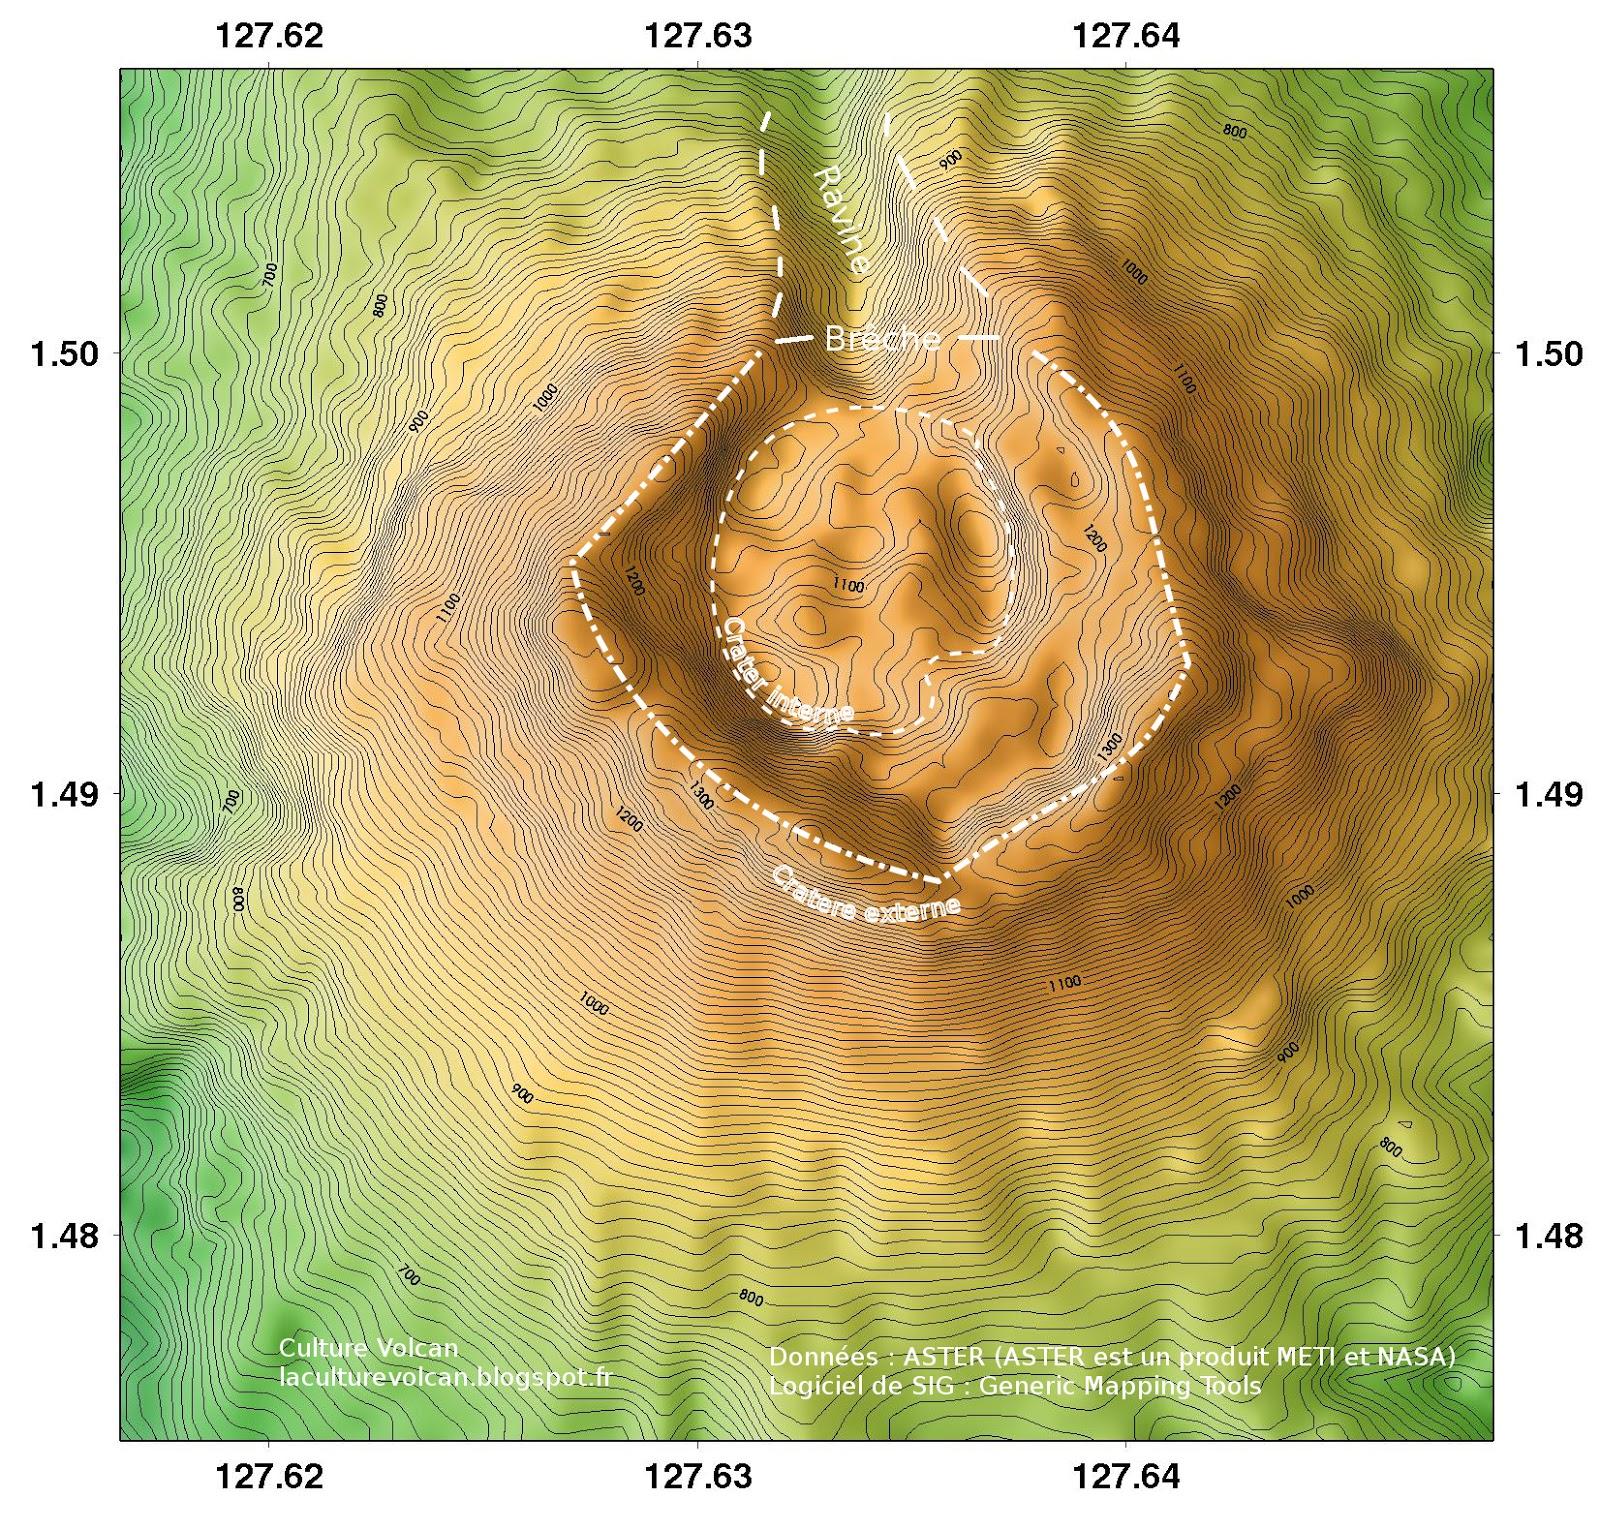 Topographie du cratère sommital du volcan Ibu